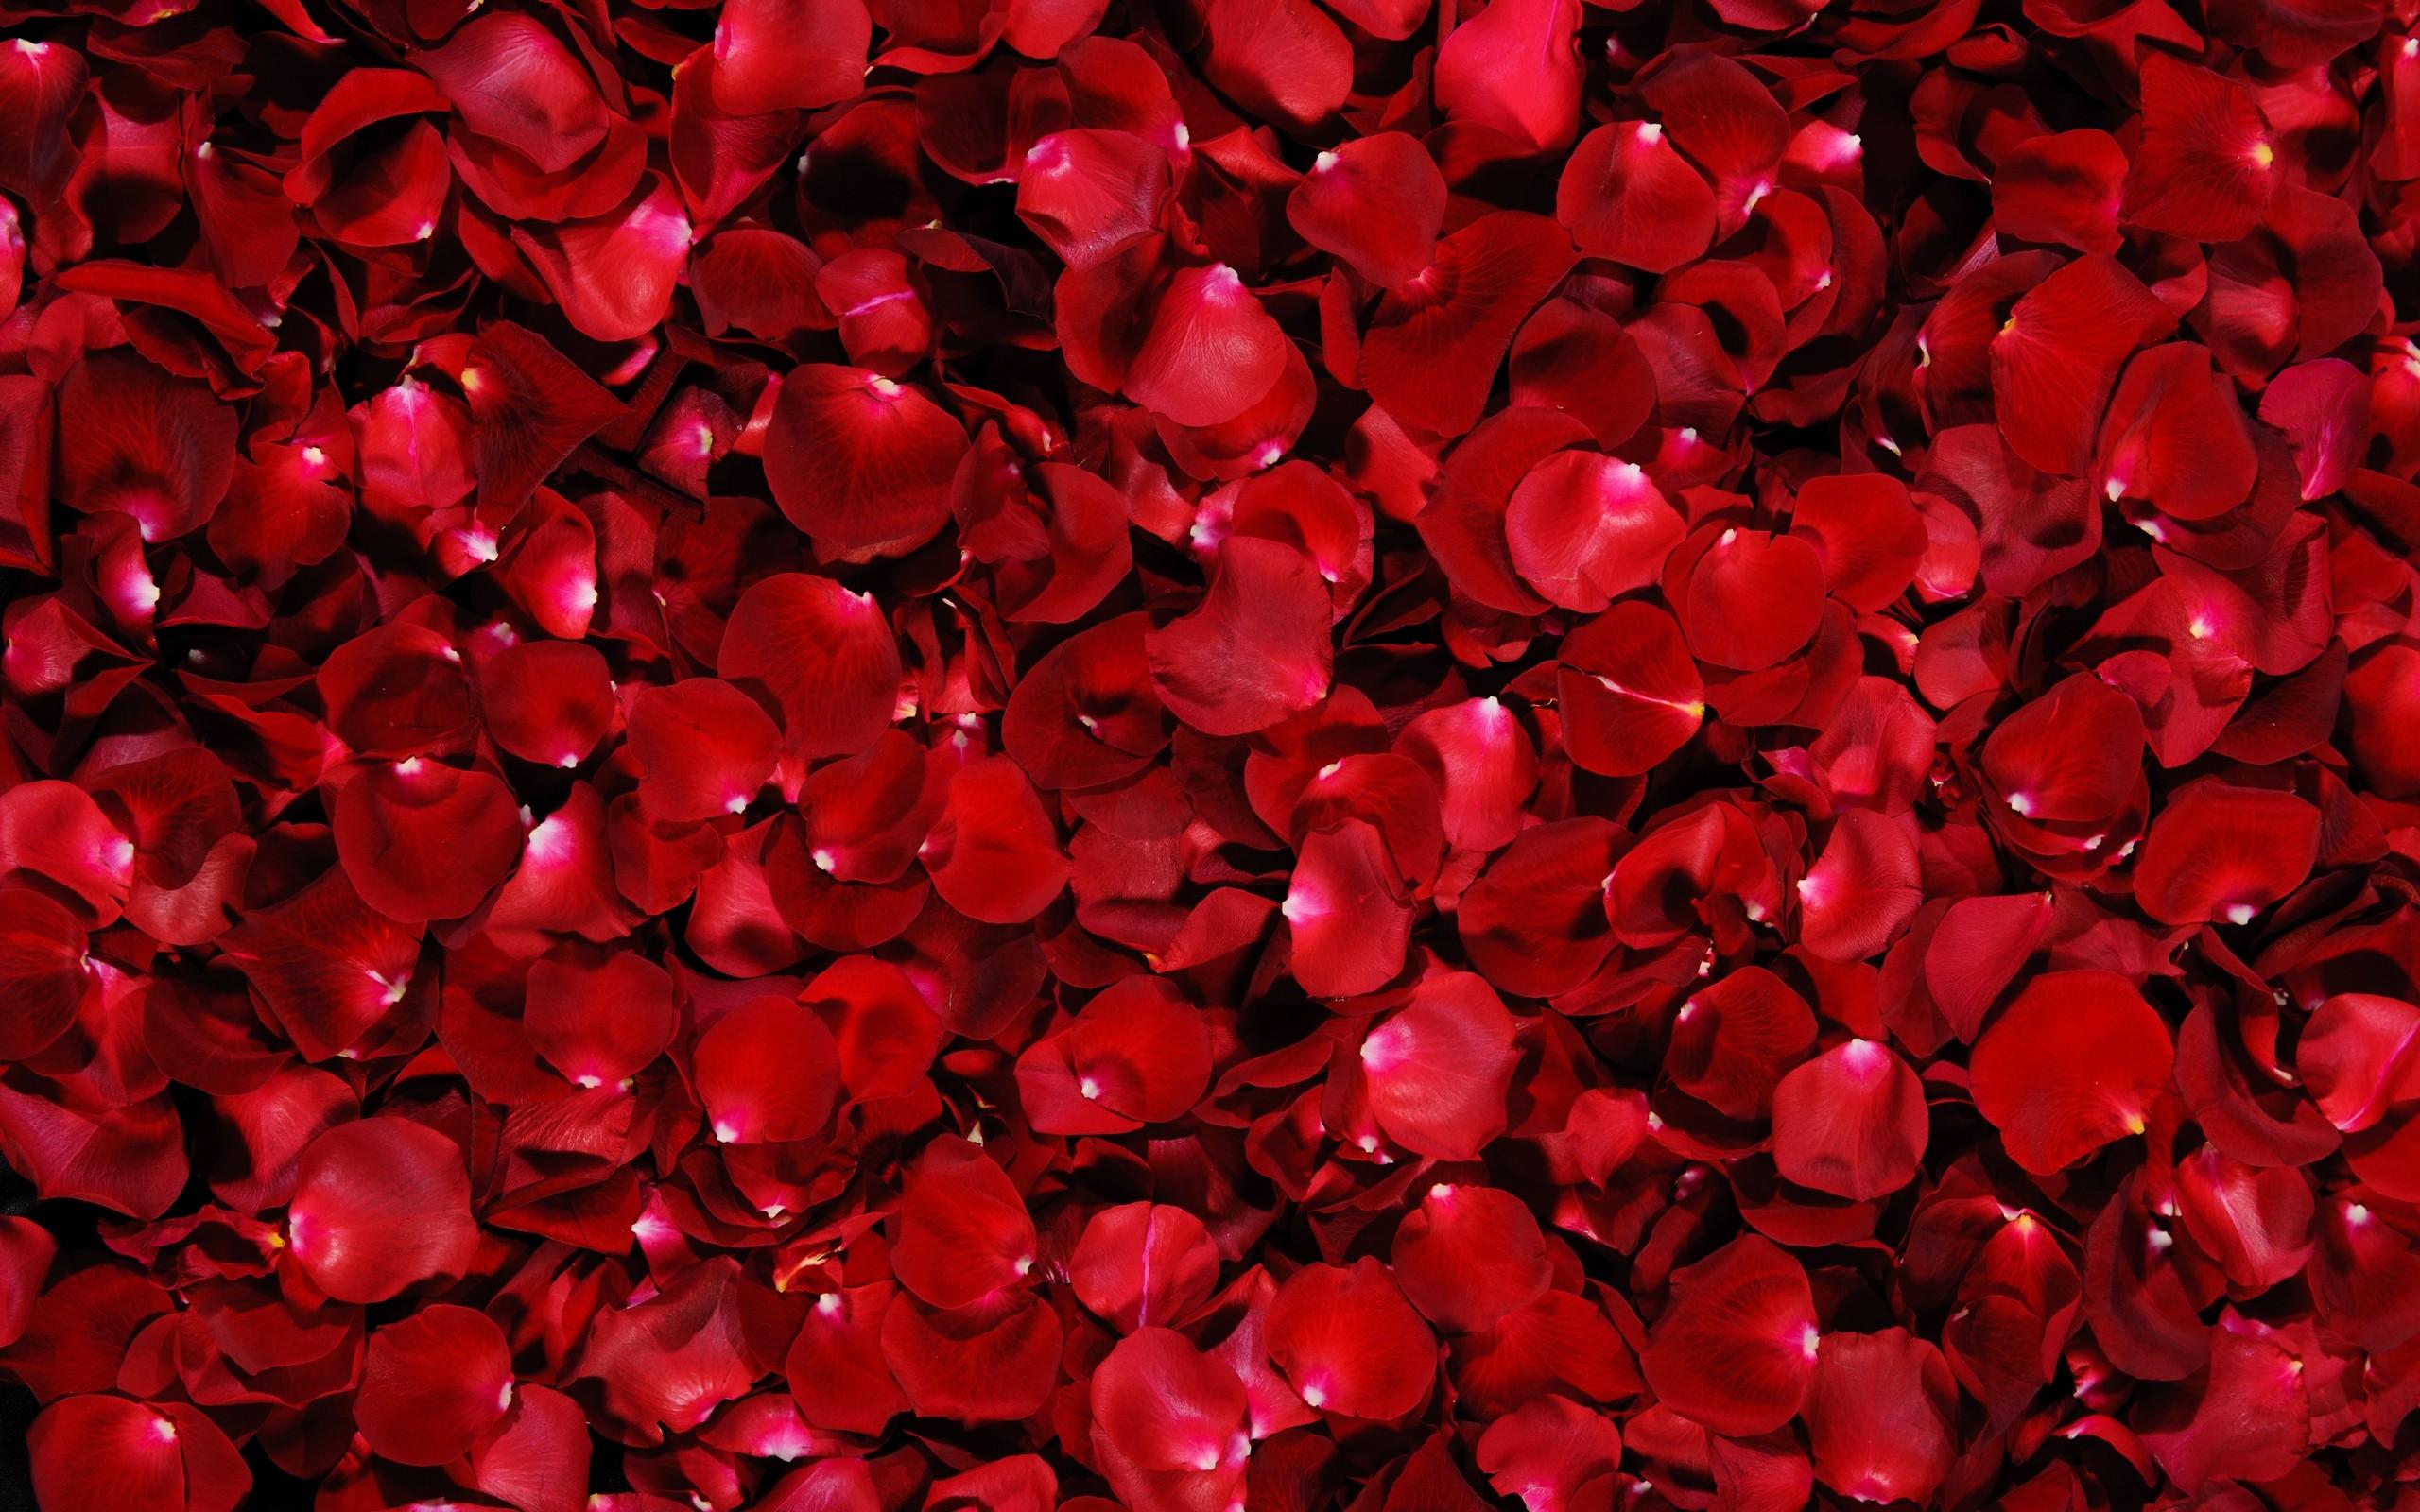 Flower Petal 25885 2880x1800 px